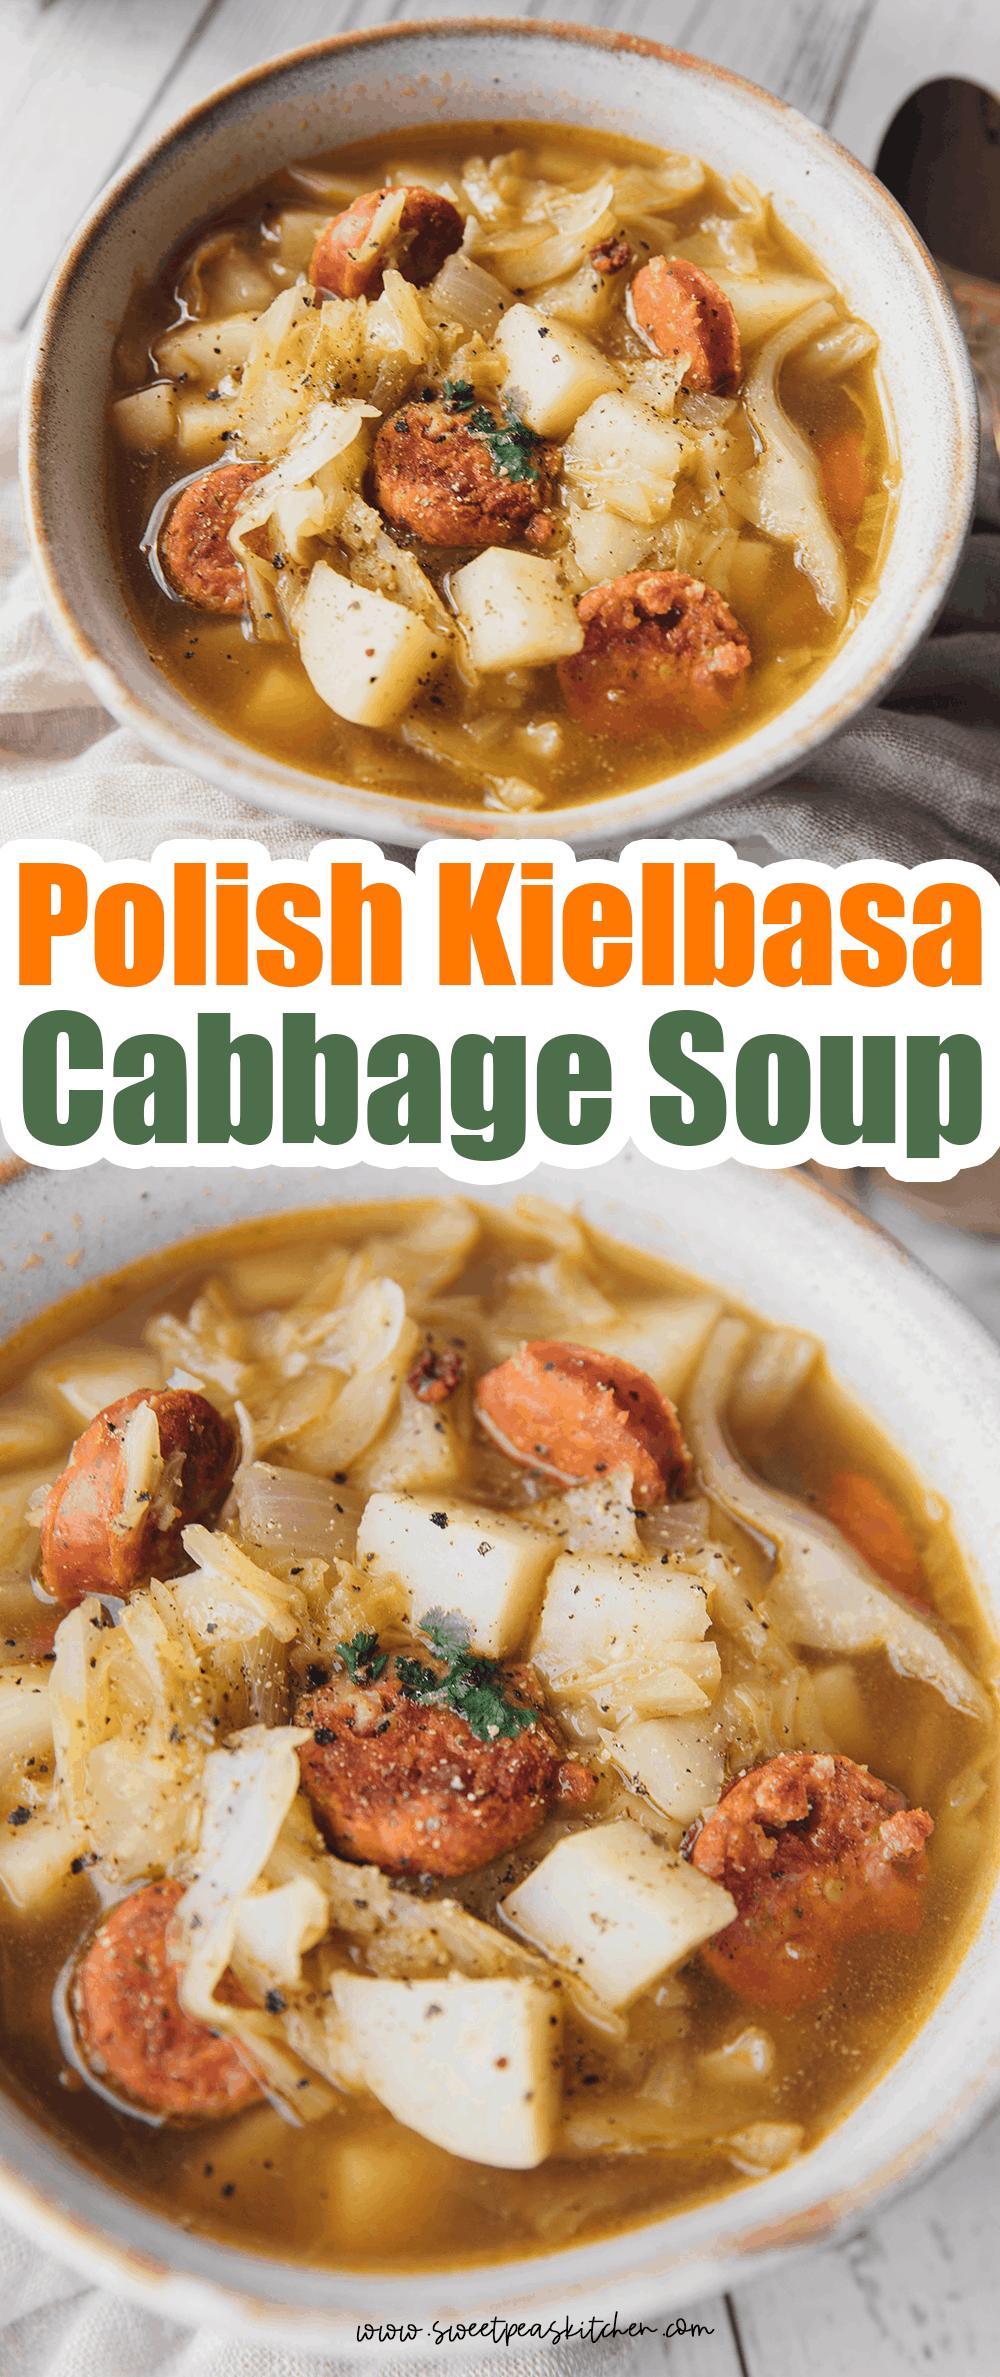 Polish Kielbasa and Cabbage Soup